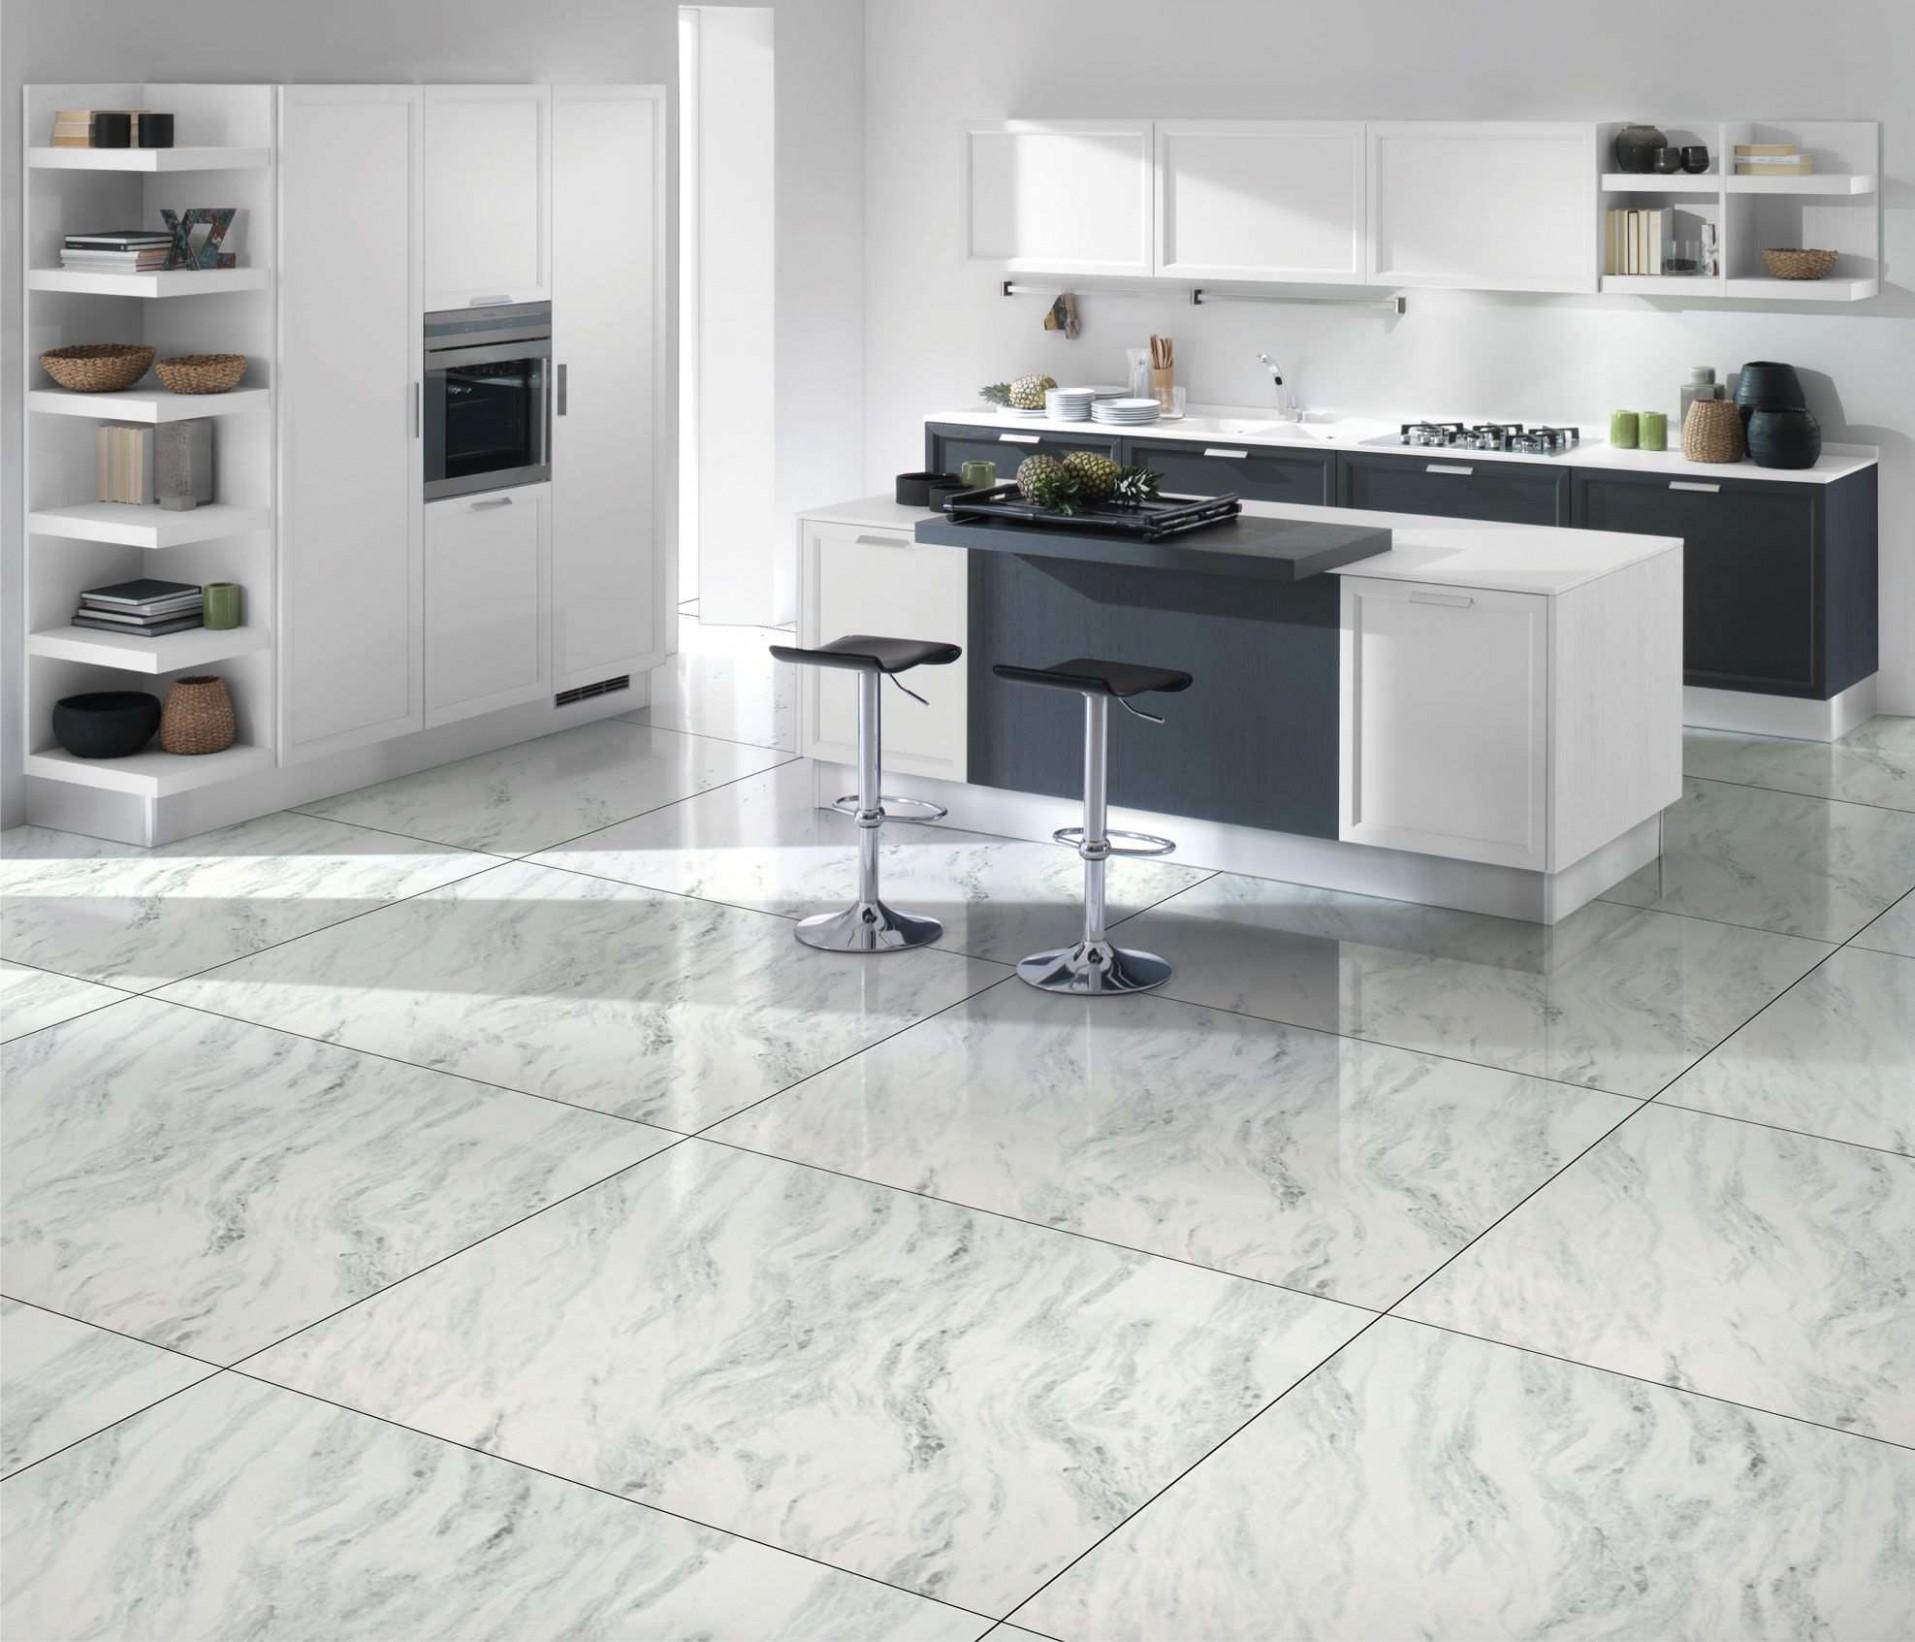 Only Furniture: Captivating Ceramic Tile Living Room Ideas Modern  - Dining Room Ideas Tile Floor